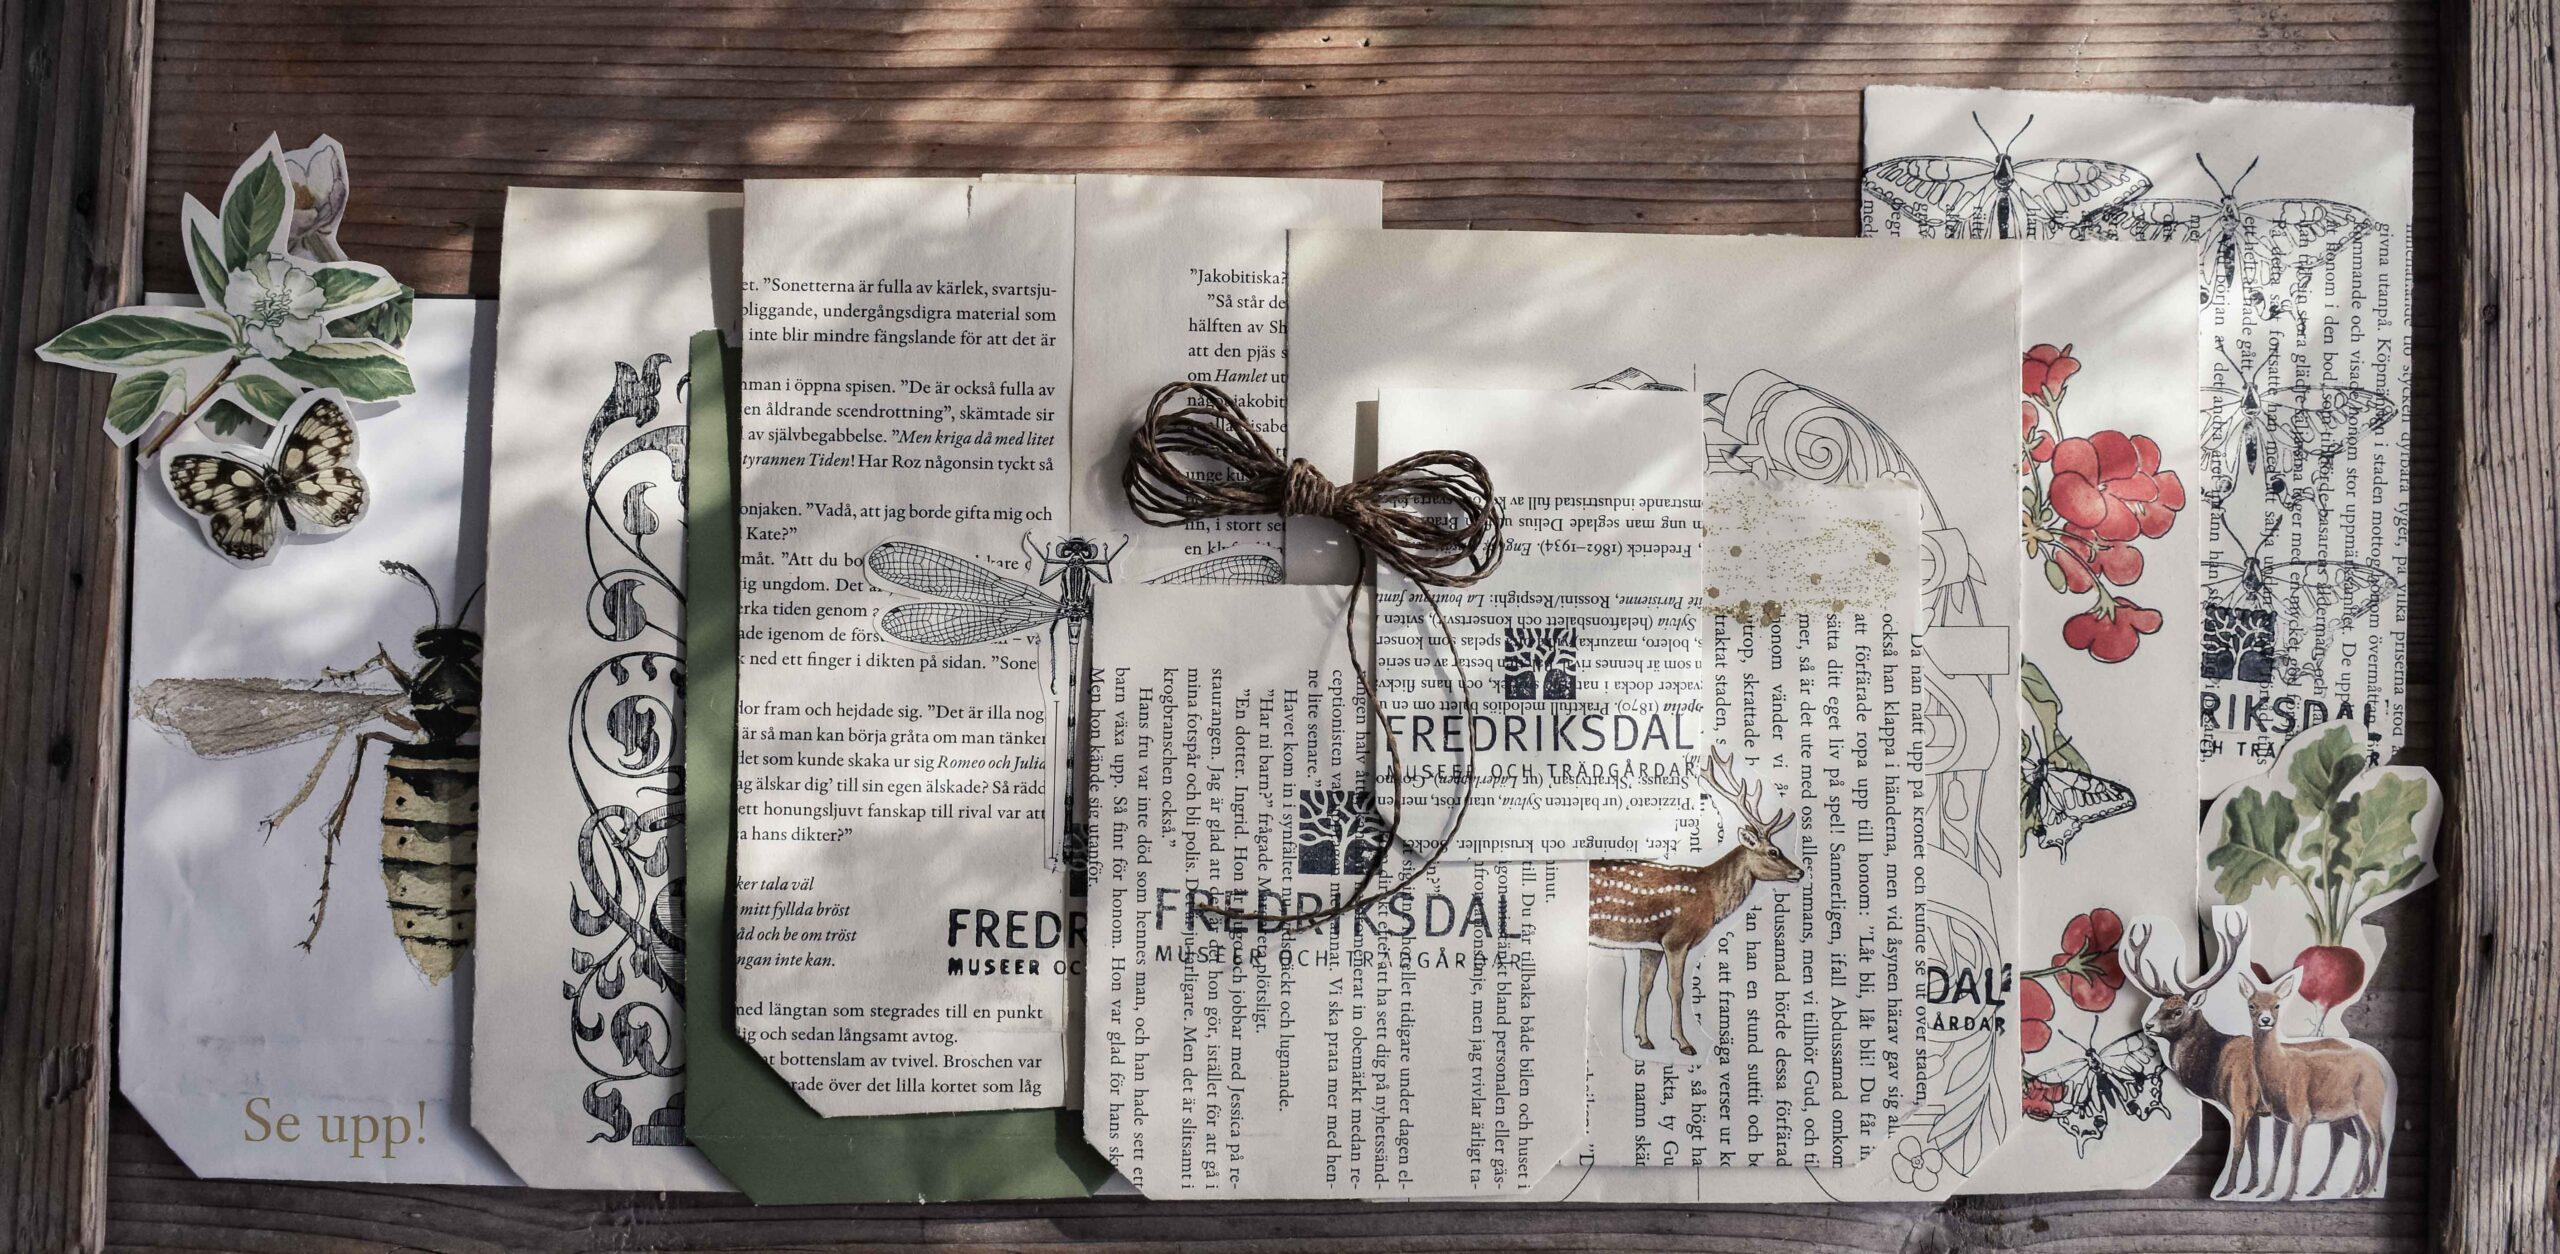 K_lagupplosta_6_book-1